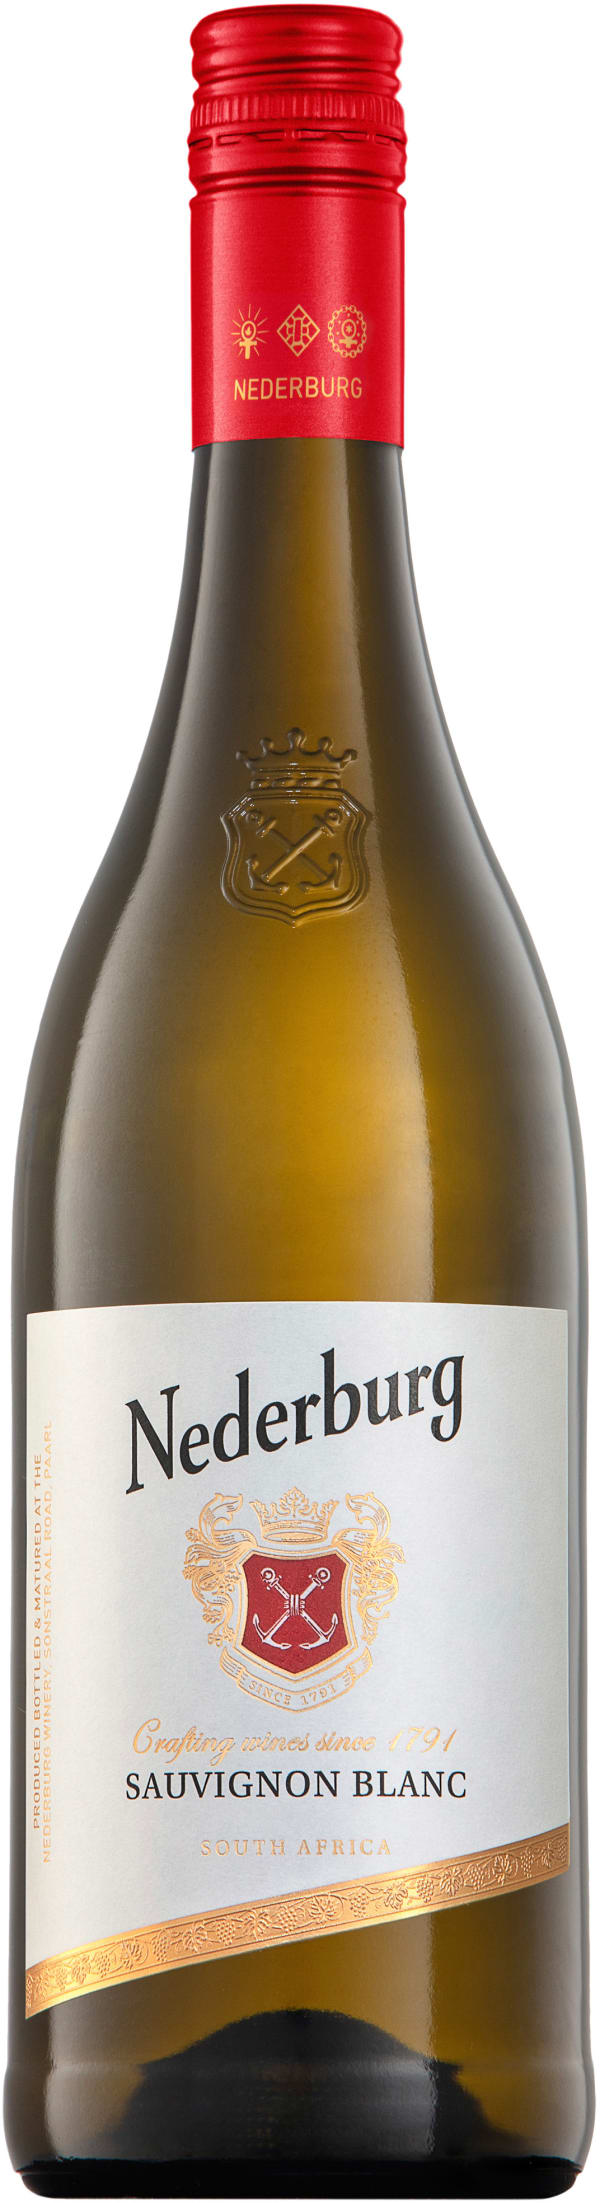 Nederburg The Winemasters Sauvignon Blanc 2019